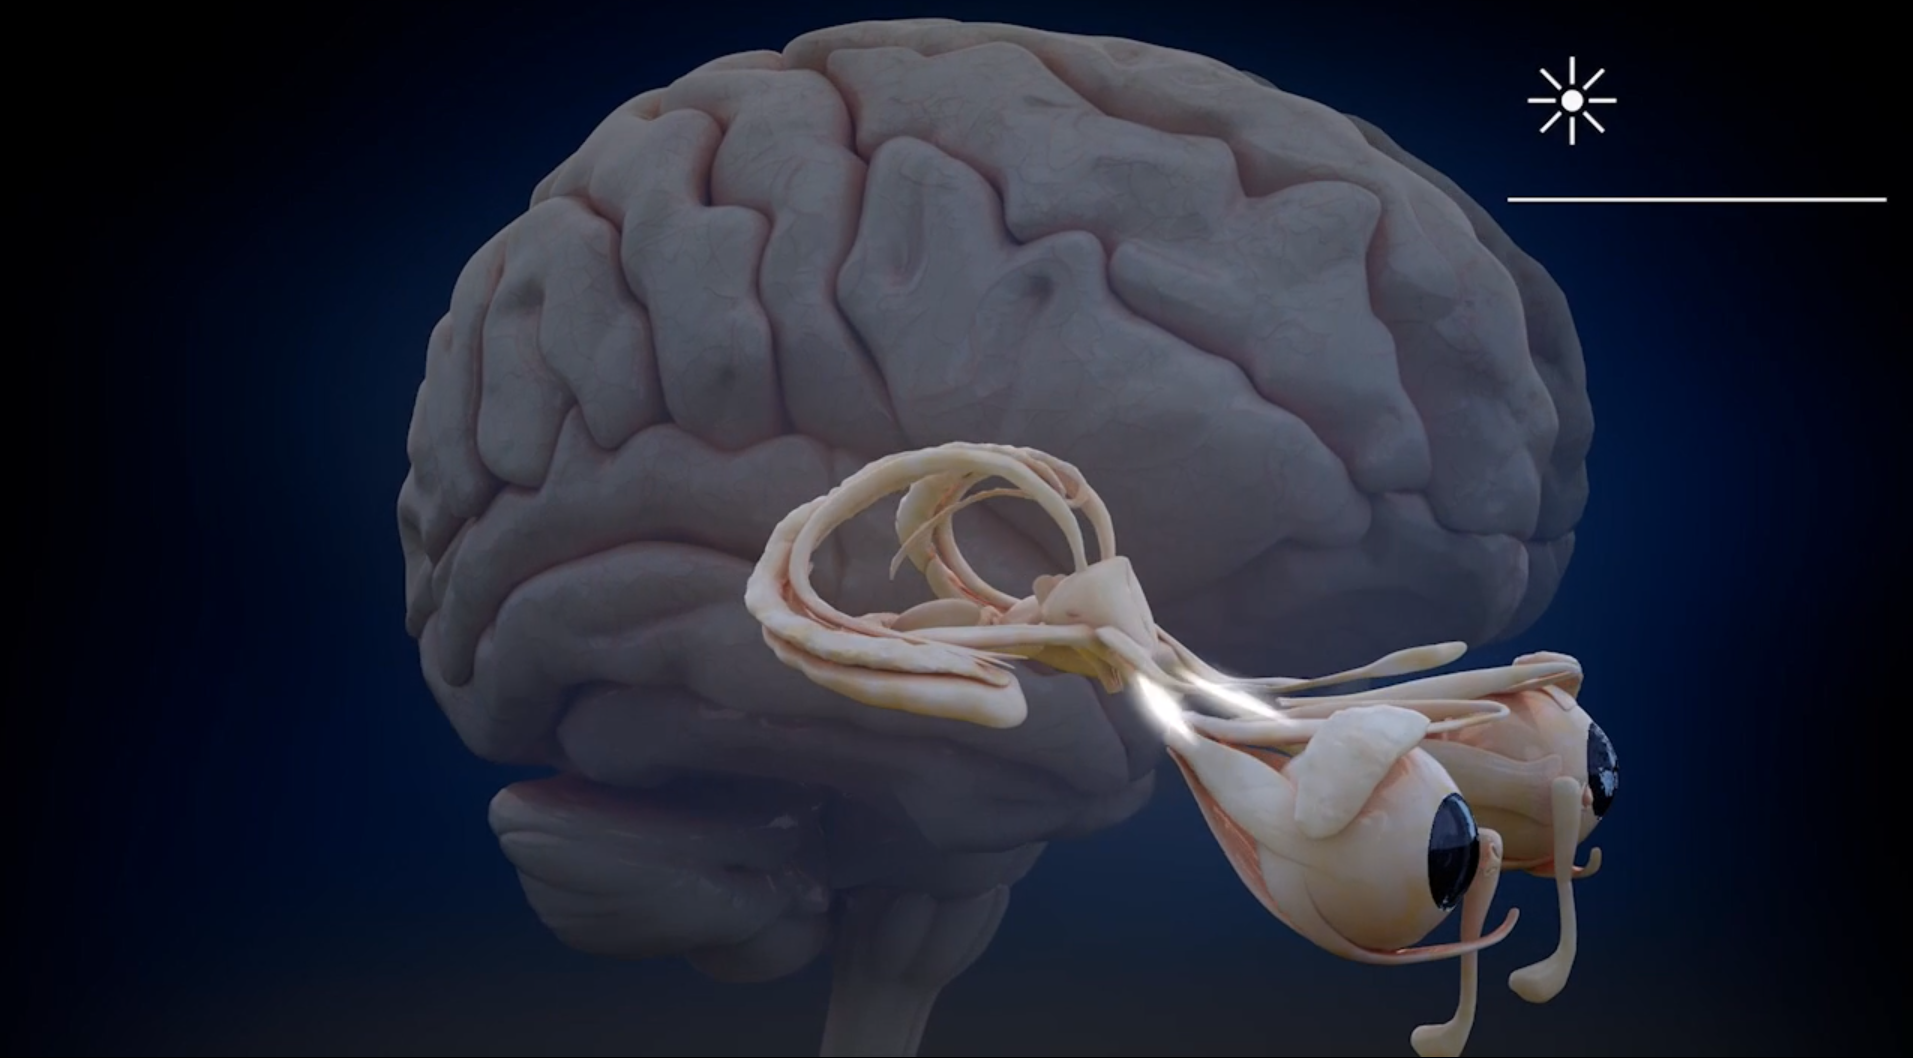 Marcin Lewandowski Cg Animation Human Eye And Retina Section